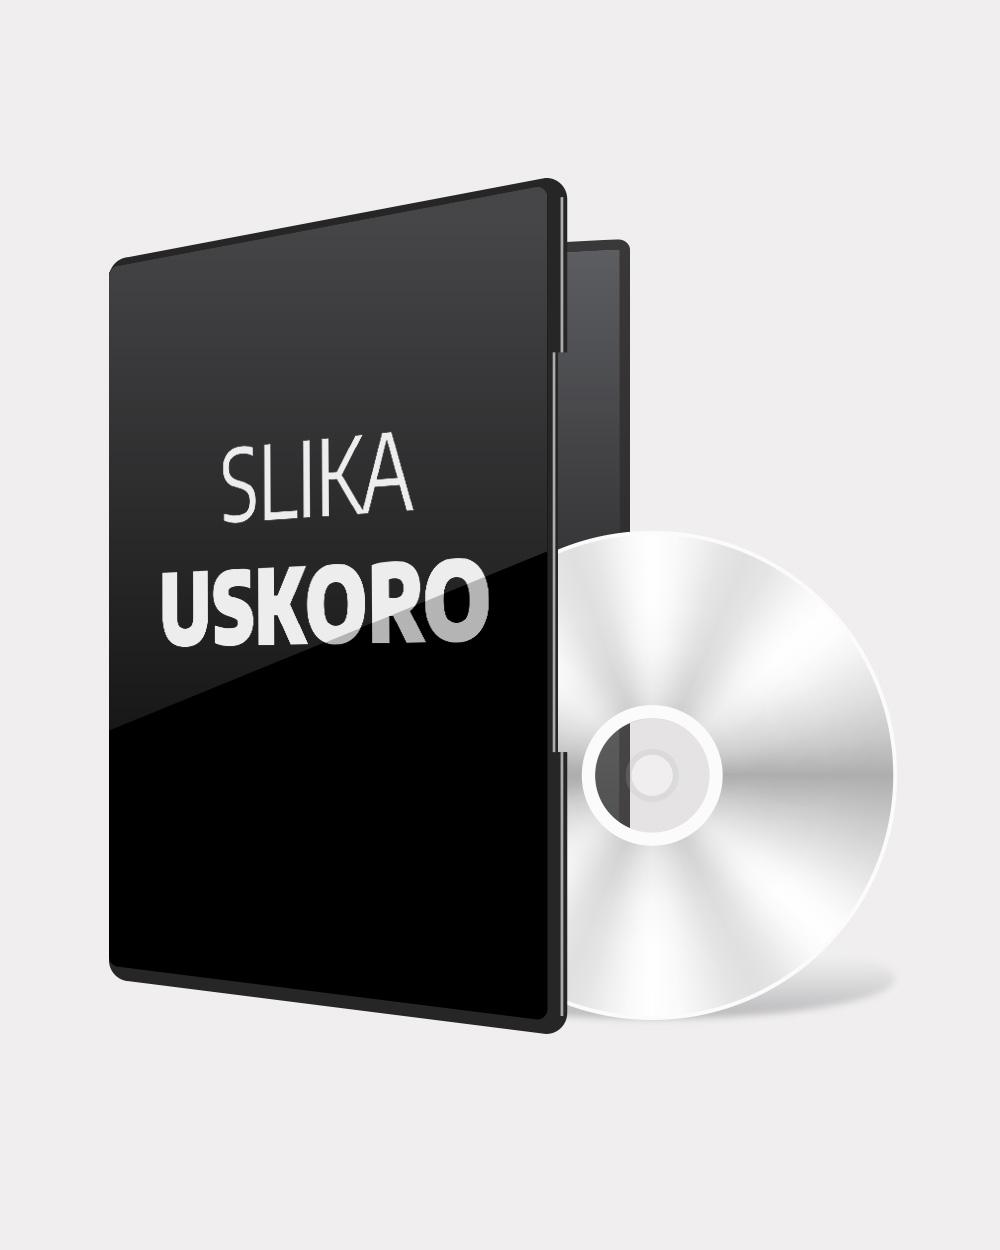 Razer komplet / Tastatura Cynosa Chroma + Miš Abyssus Essential + Podloga Goliathus Chroma - Holiday Bundle